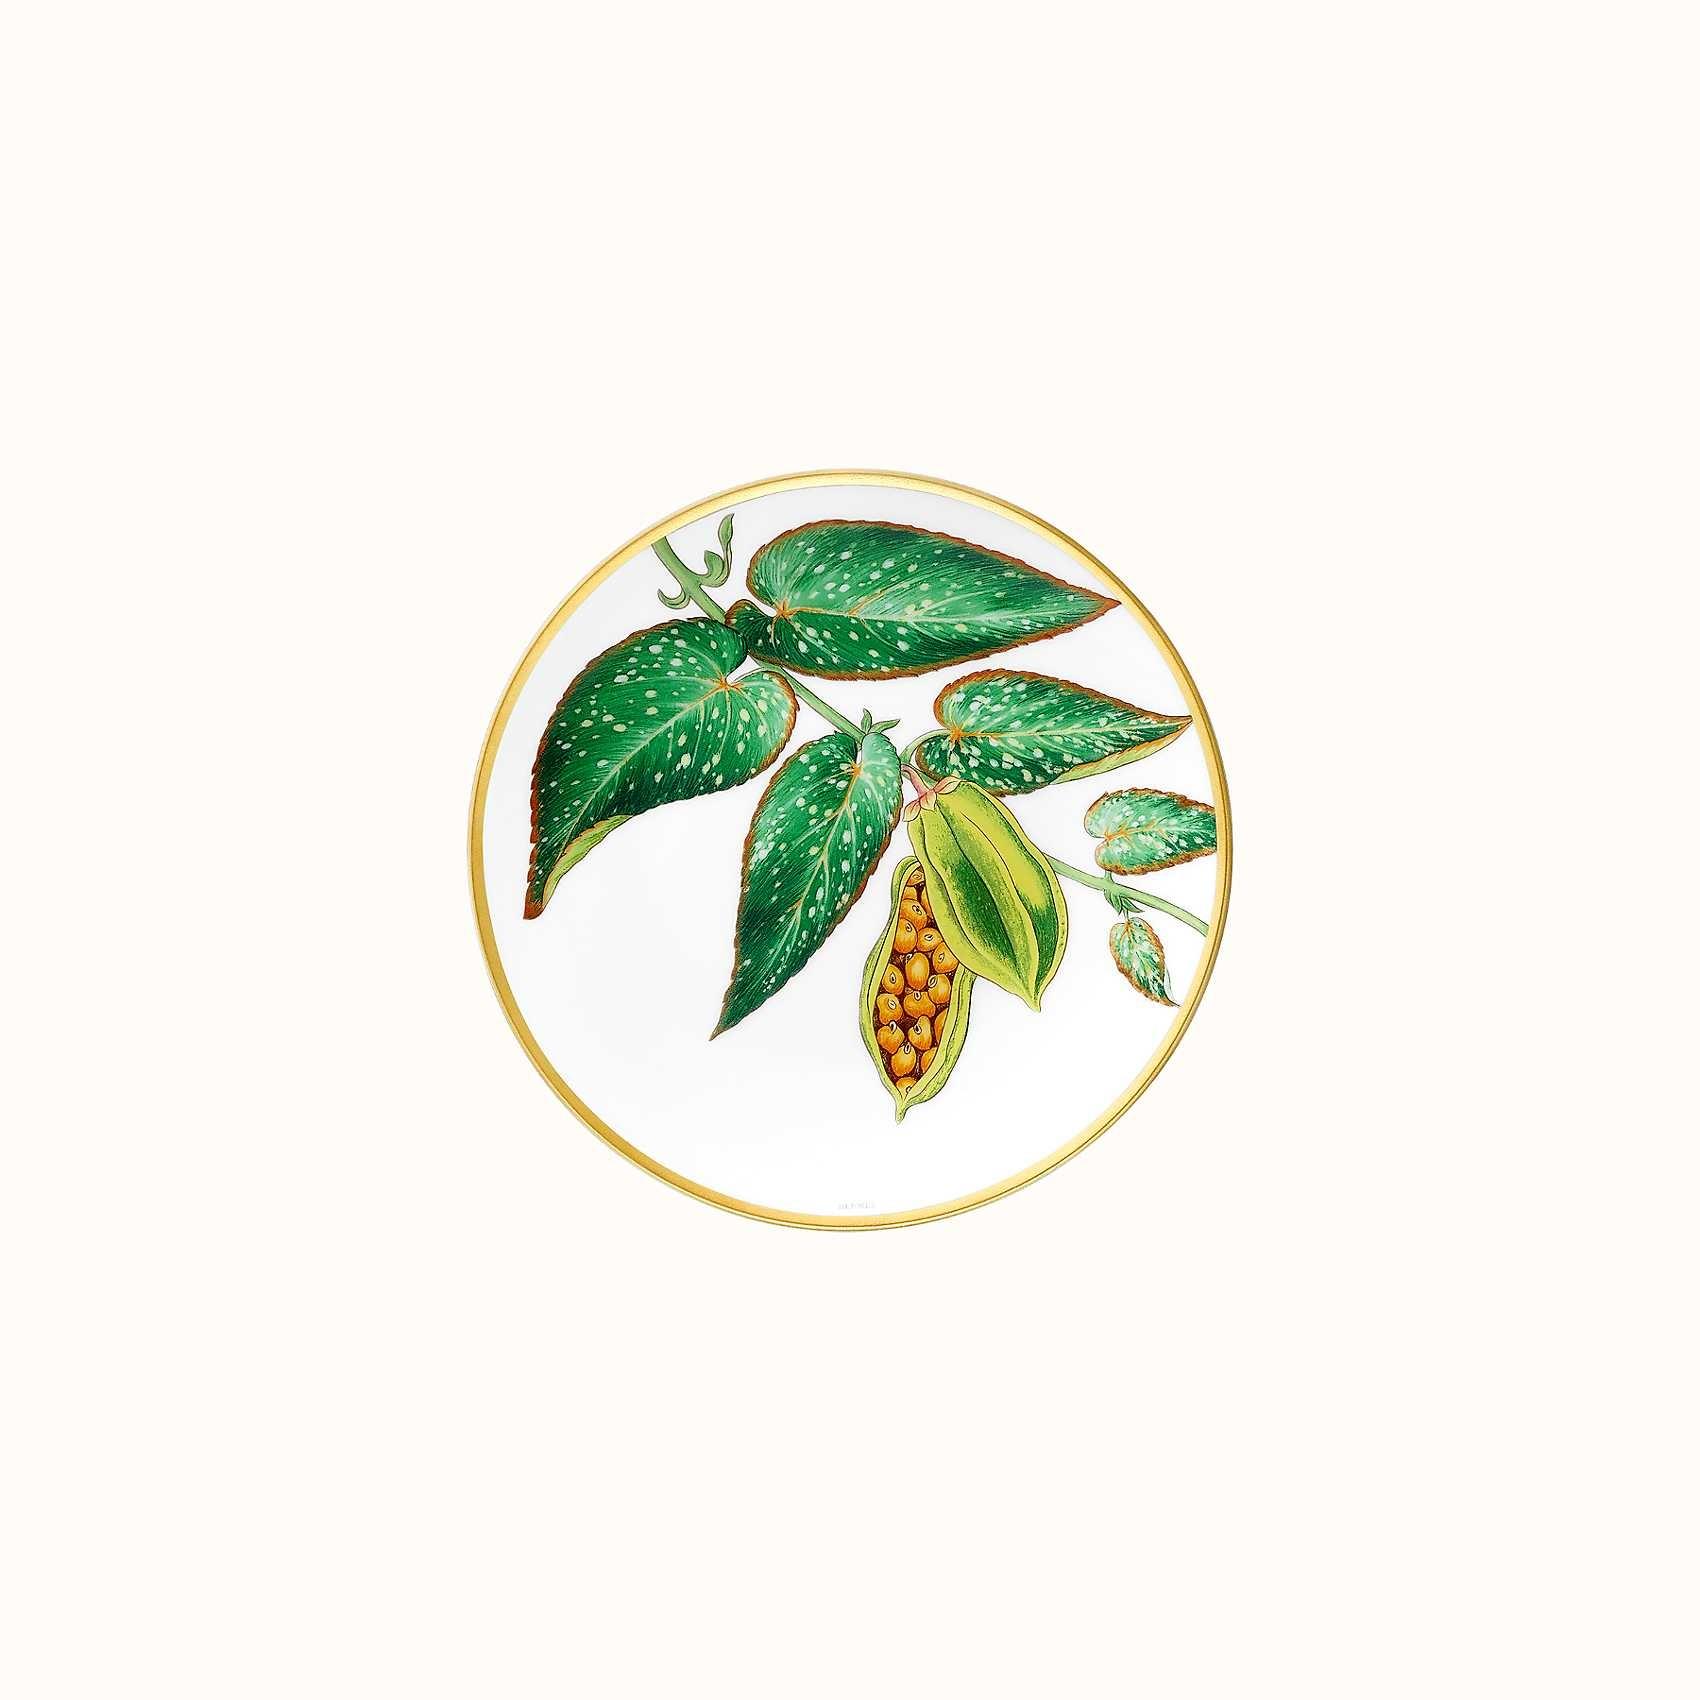 Hermes Passifolia Bread & Butter Plate Tamaya